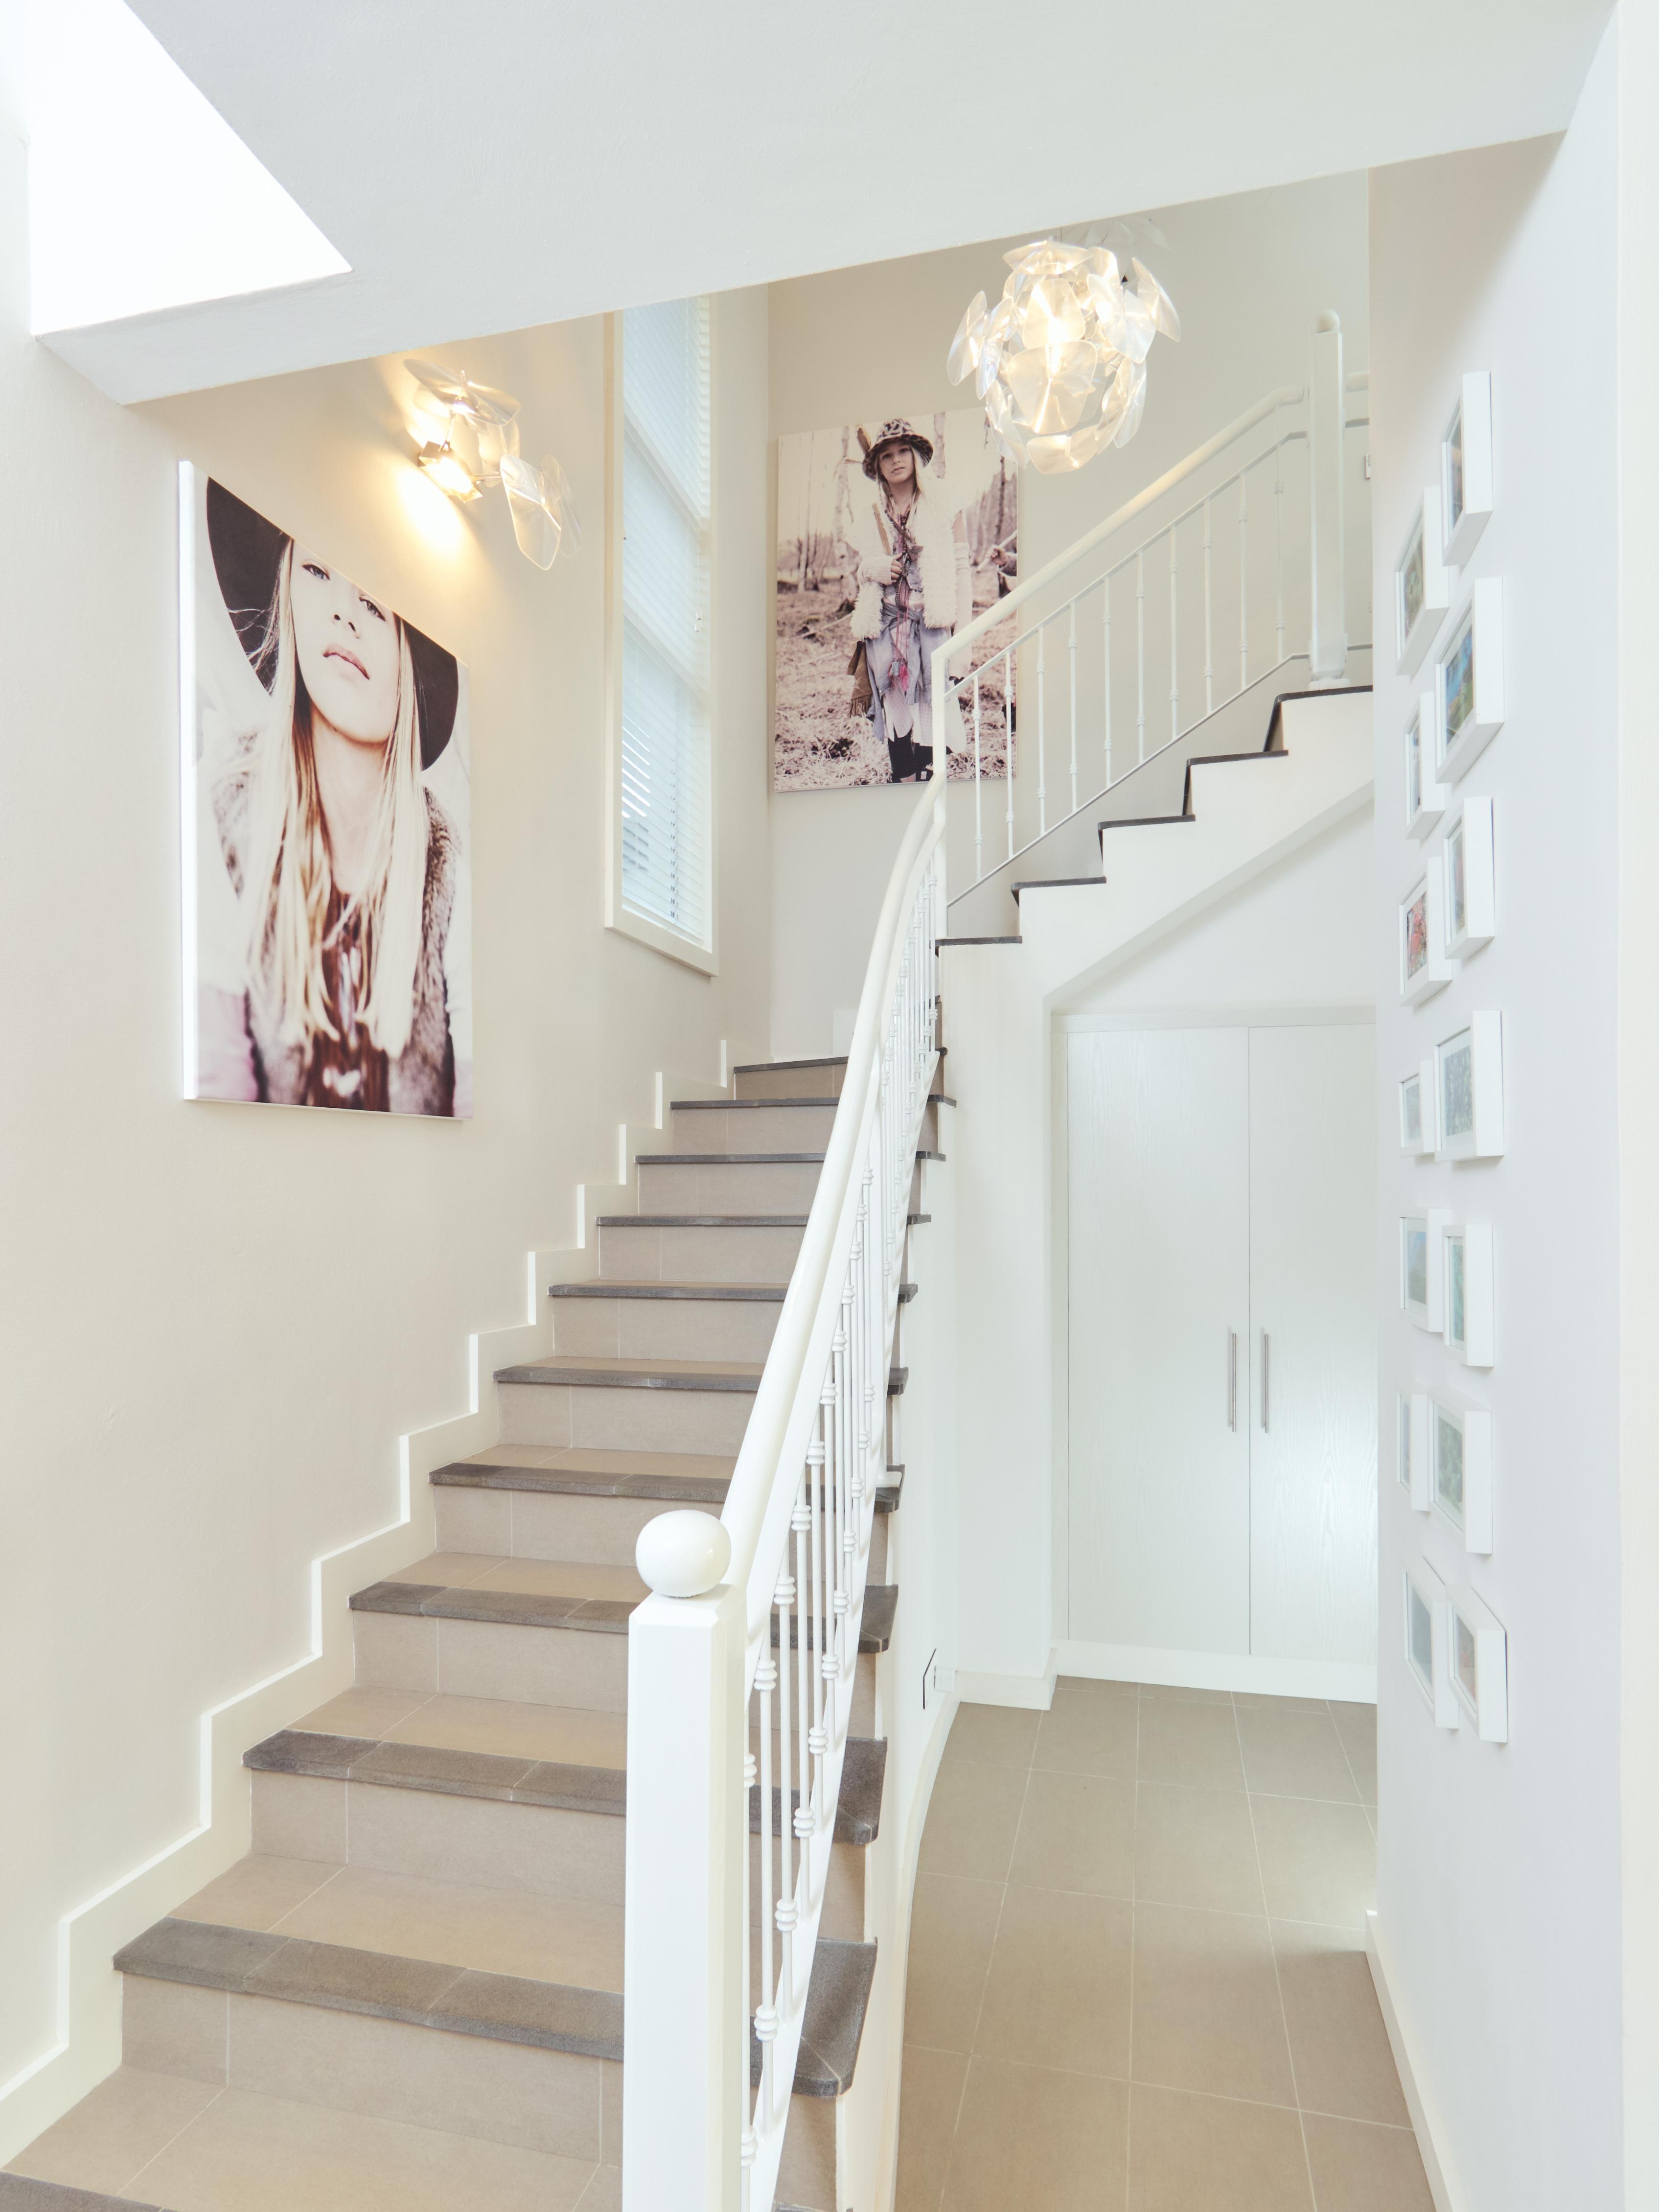 Wandgestaltung f r den flur bilder ideen couch - Dunkelblaue couch welche wandfarbe ...